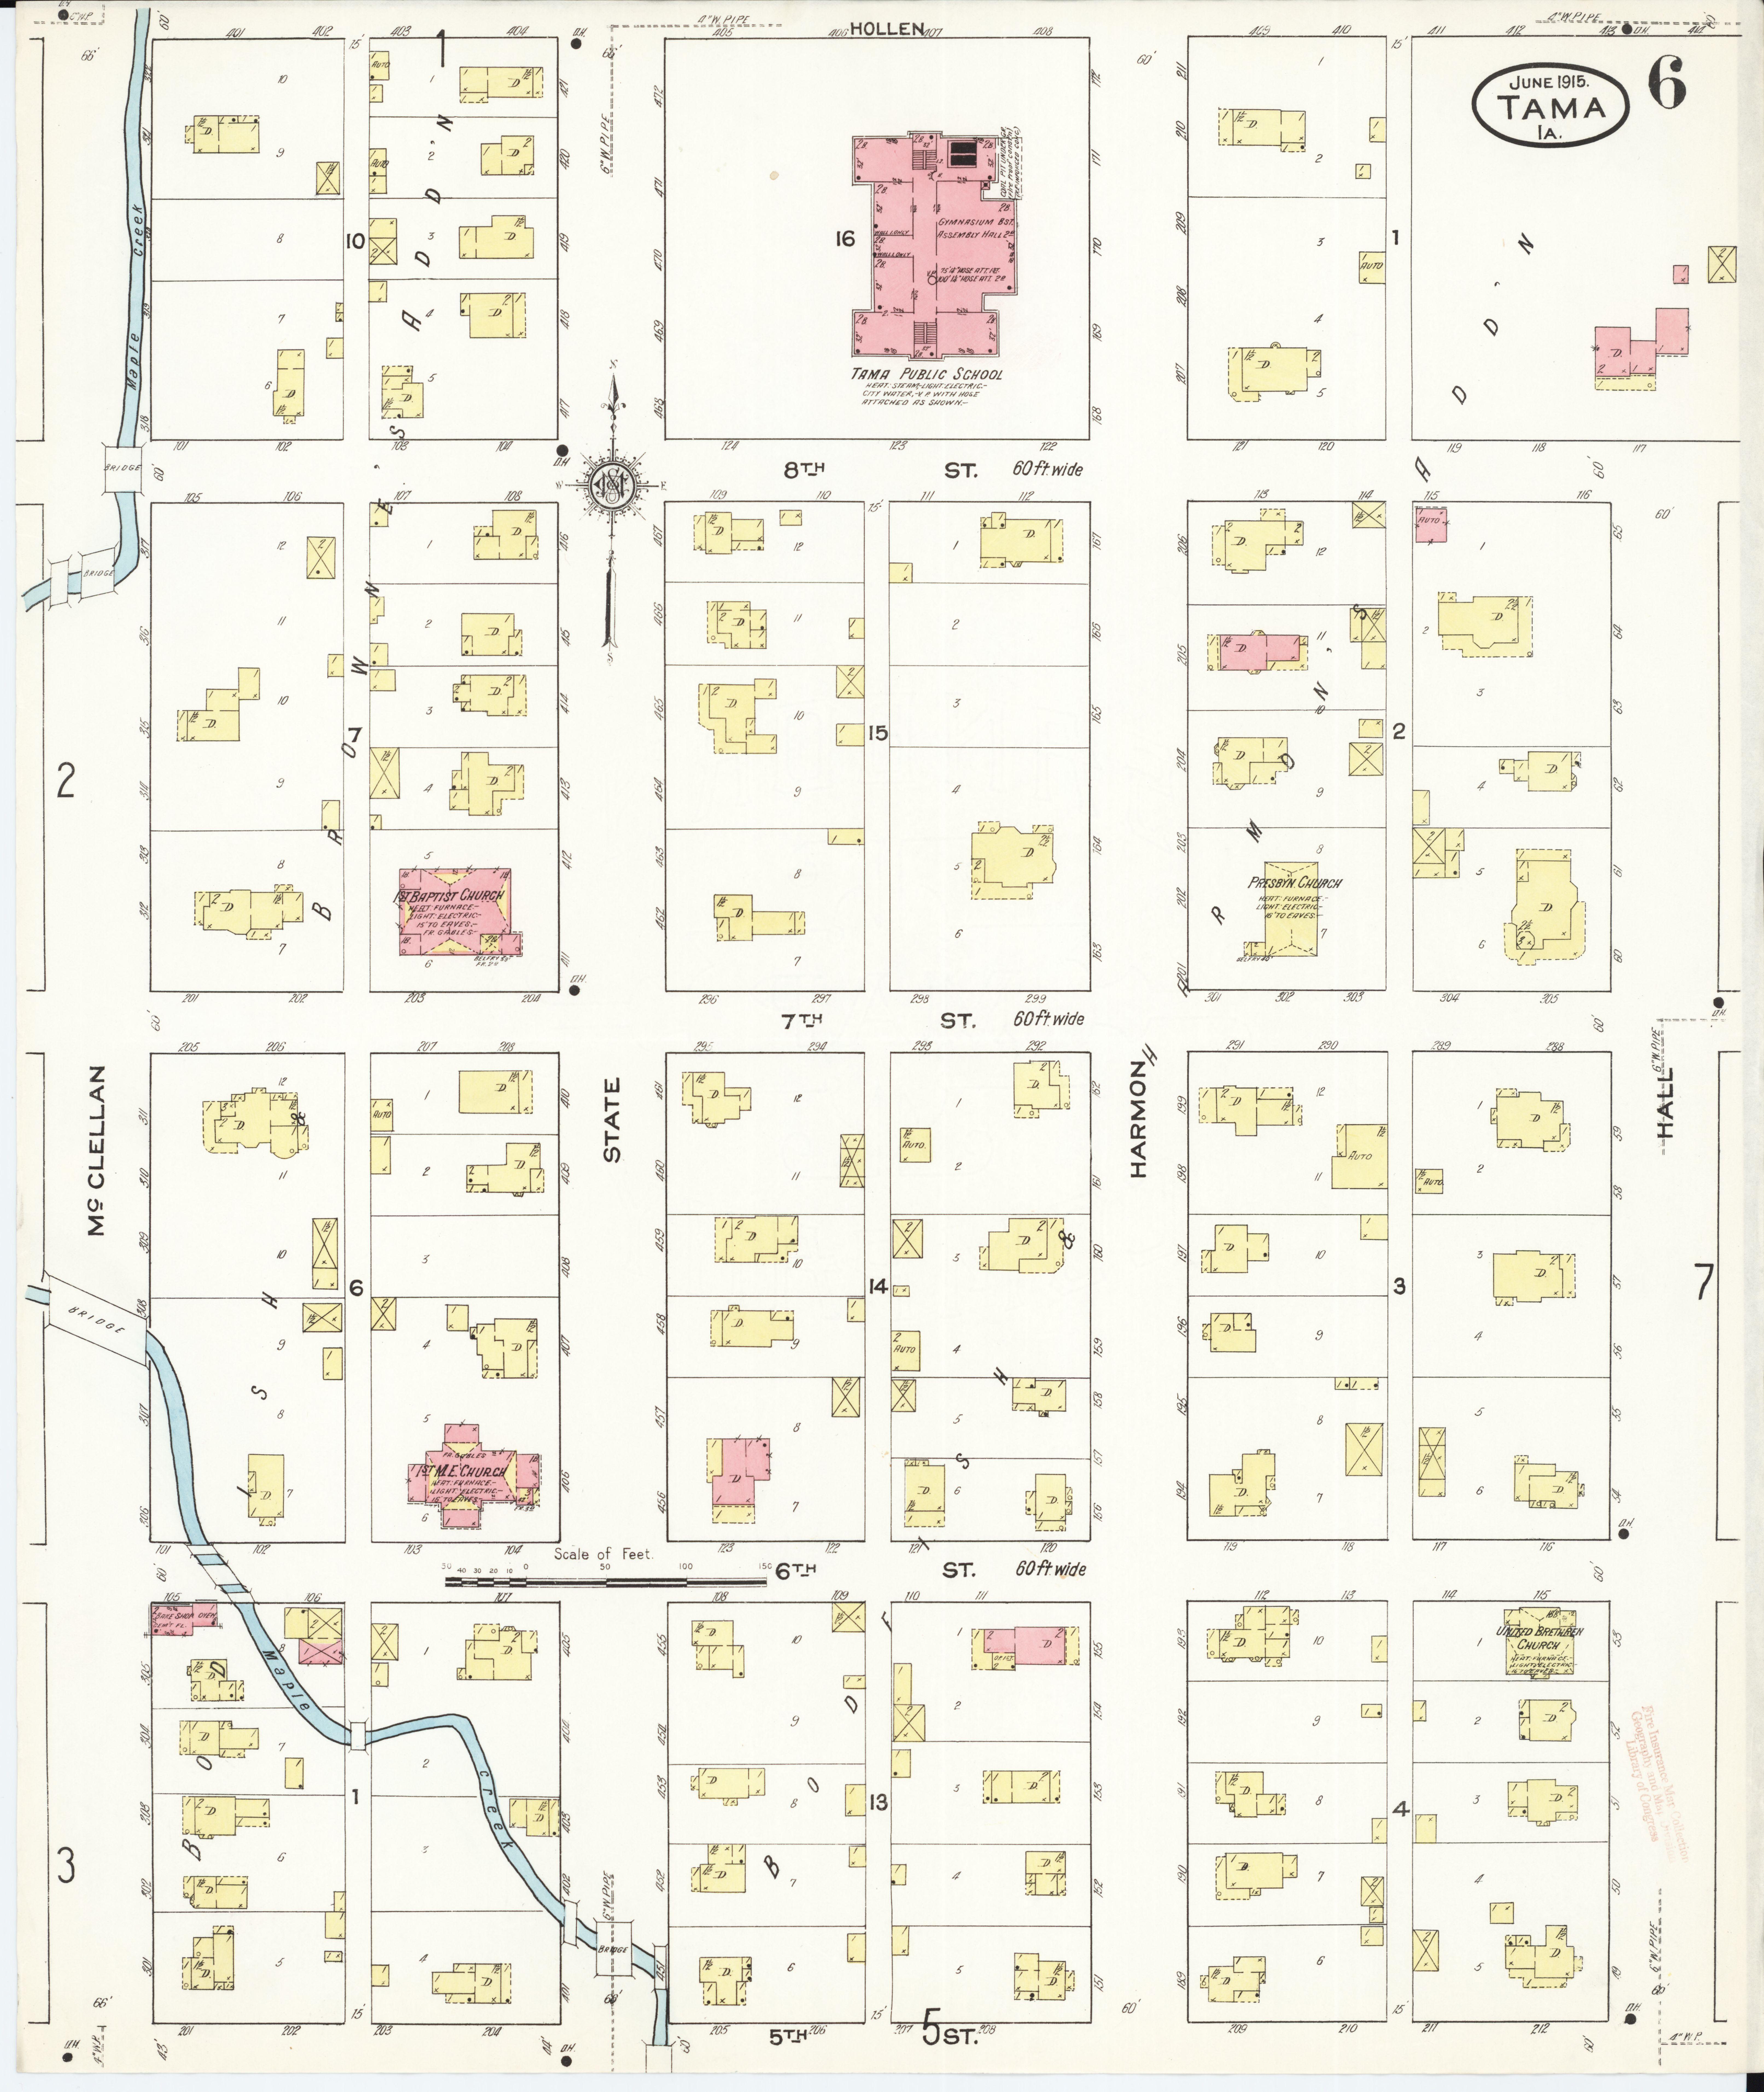 File:Sanborn Fire Insurance Map from Tama, Tama County, Iowa